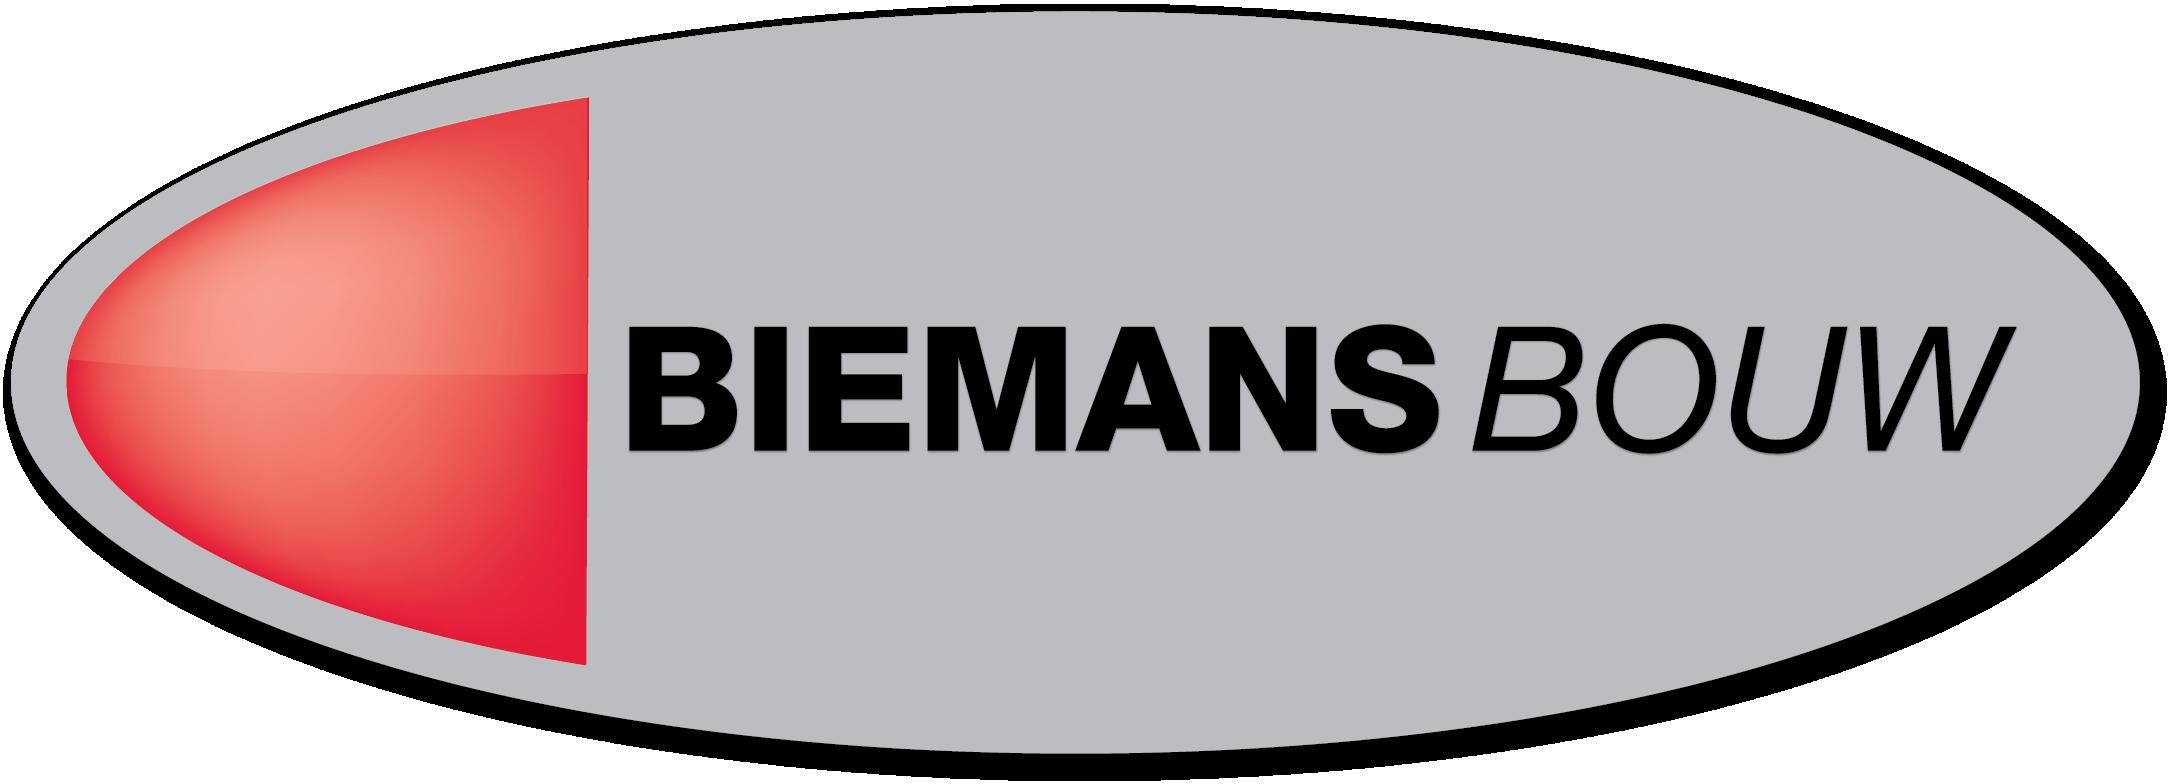 Biemans Bouw